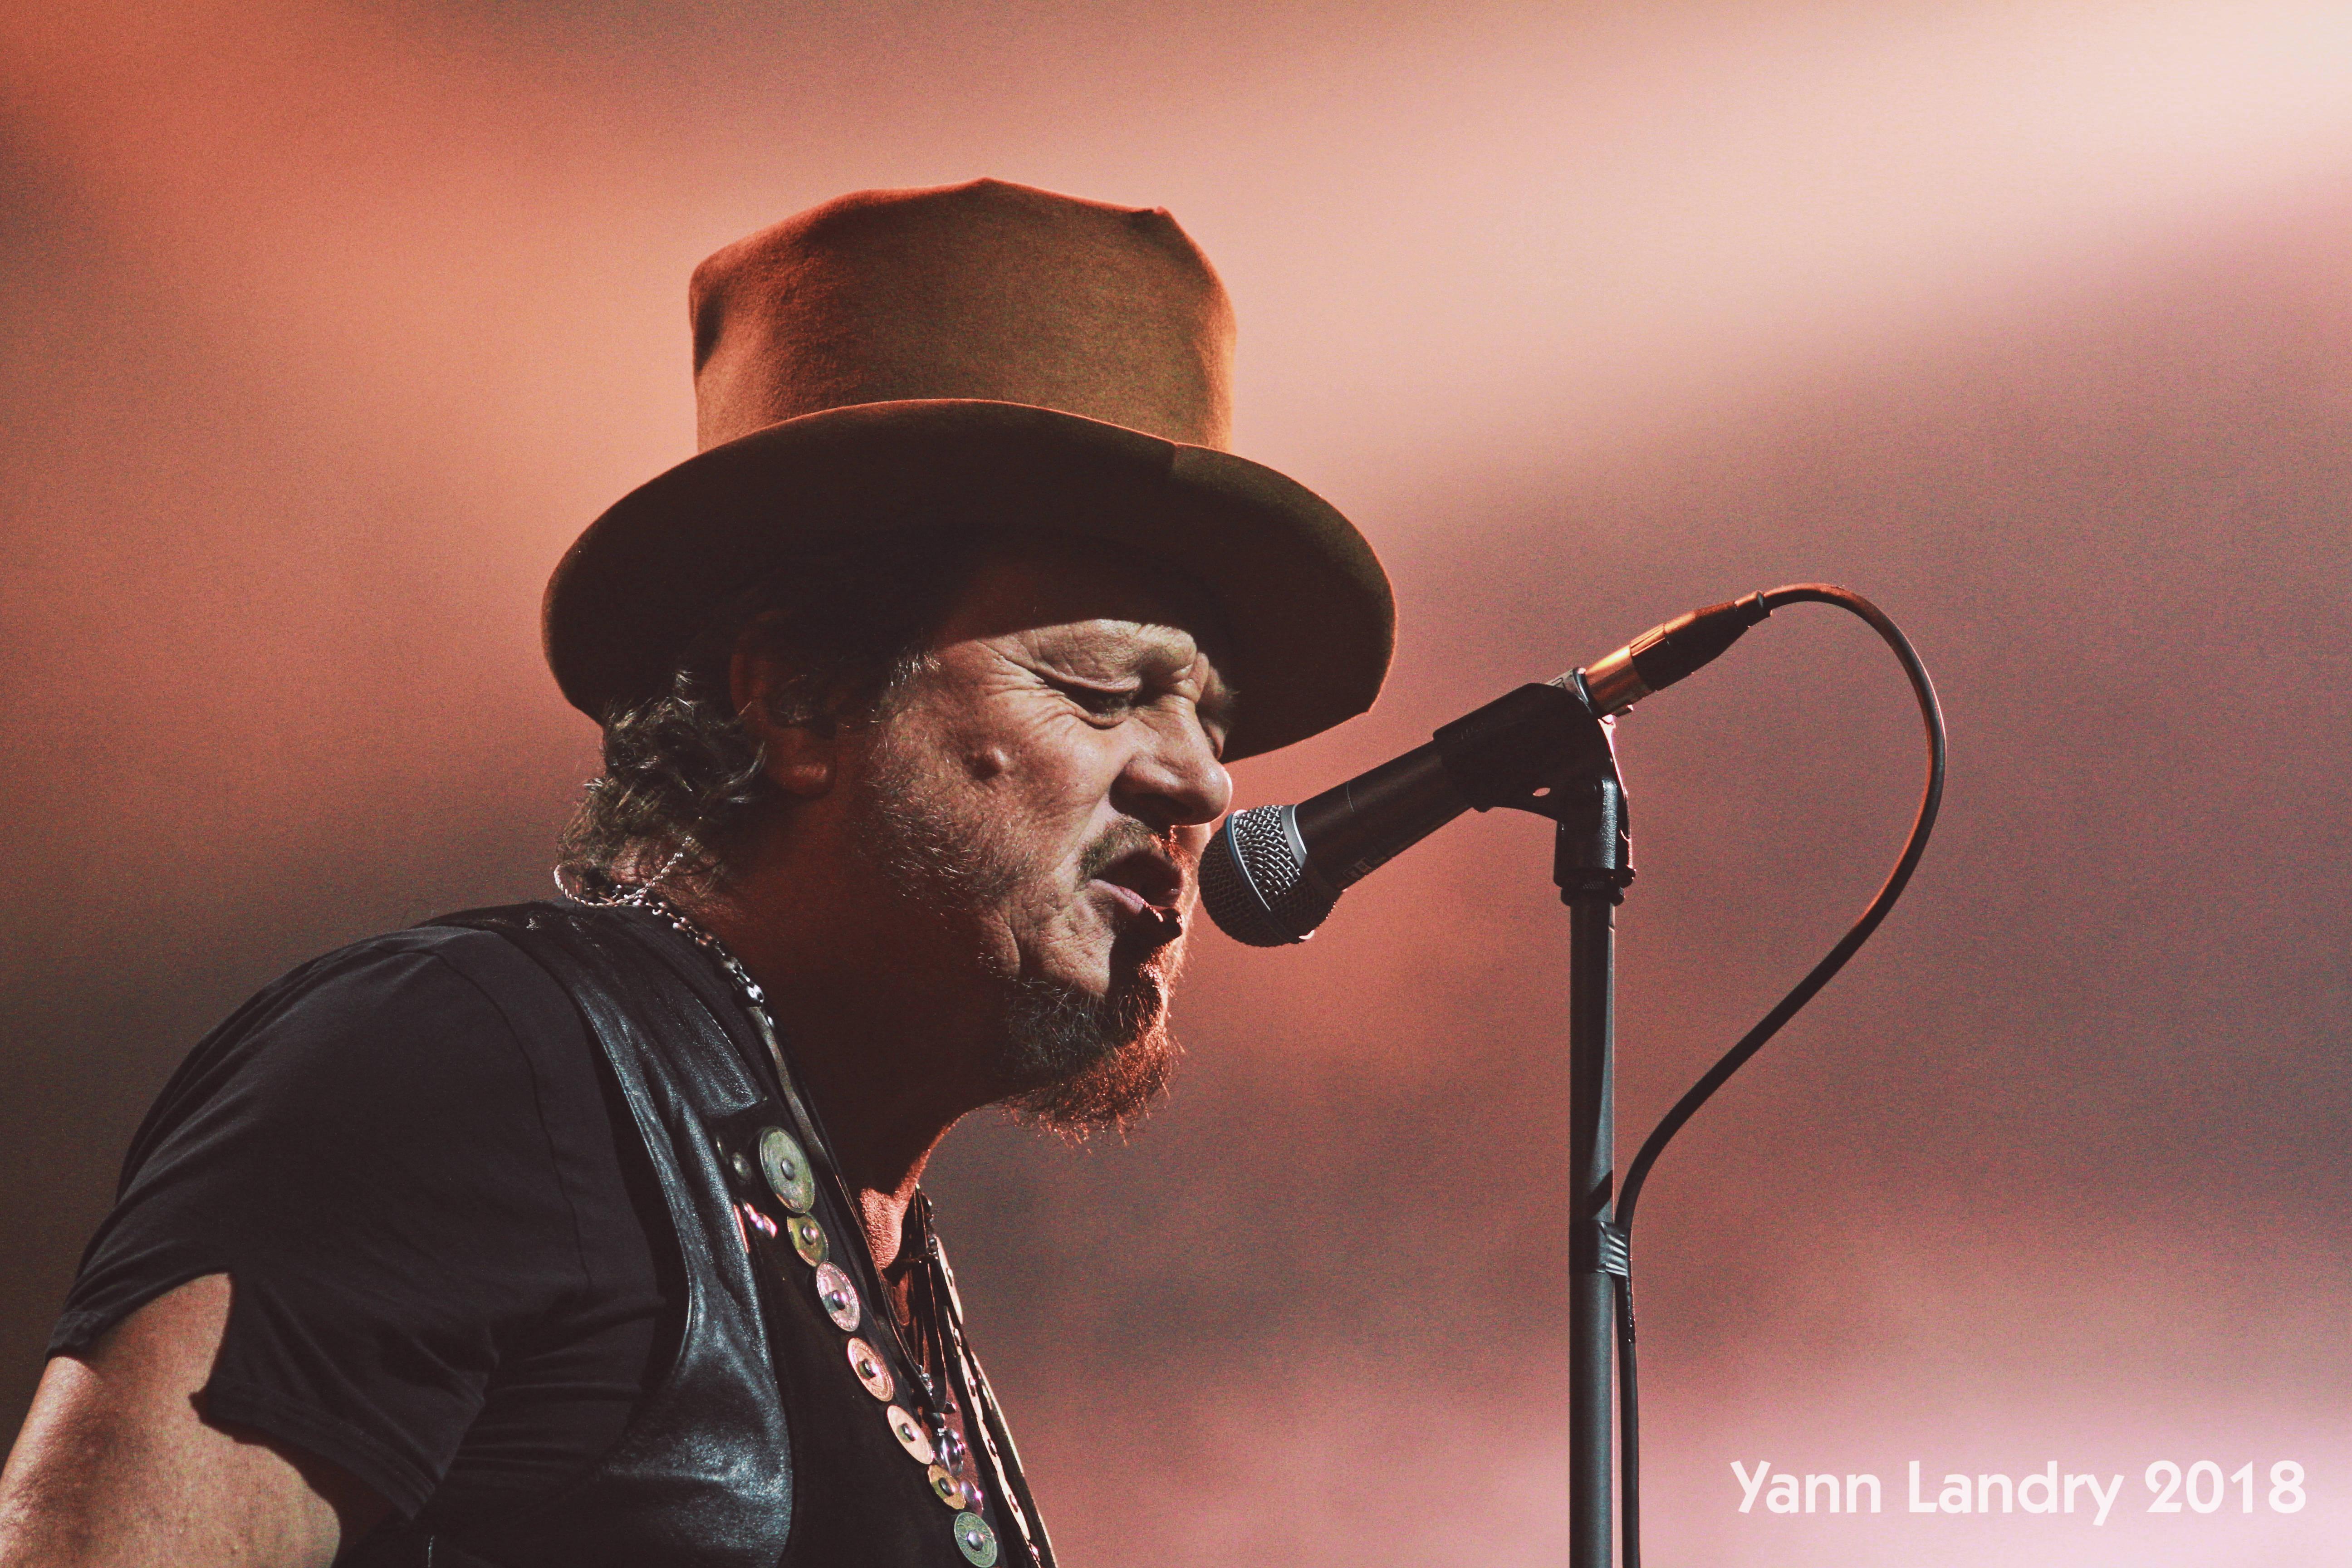 joli chapeau, #faislatronche, Yann Landry, POP